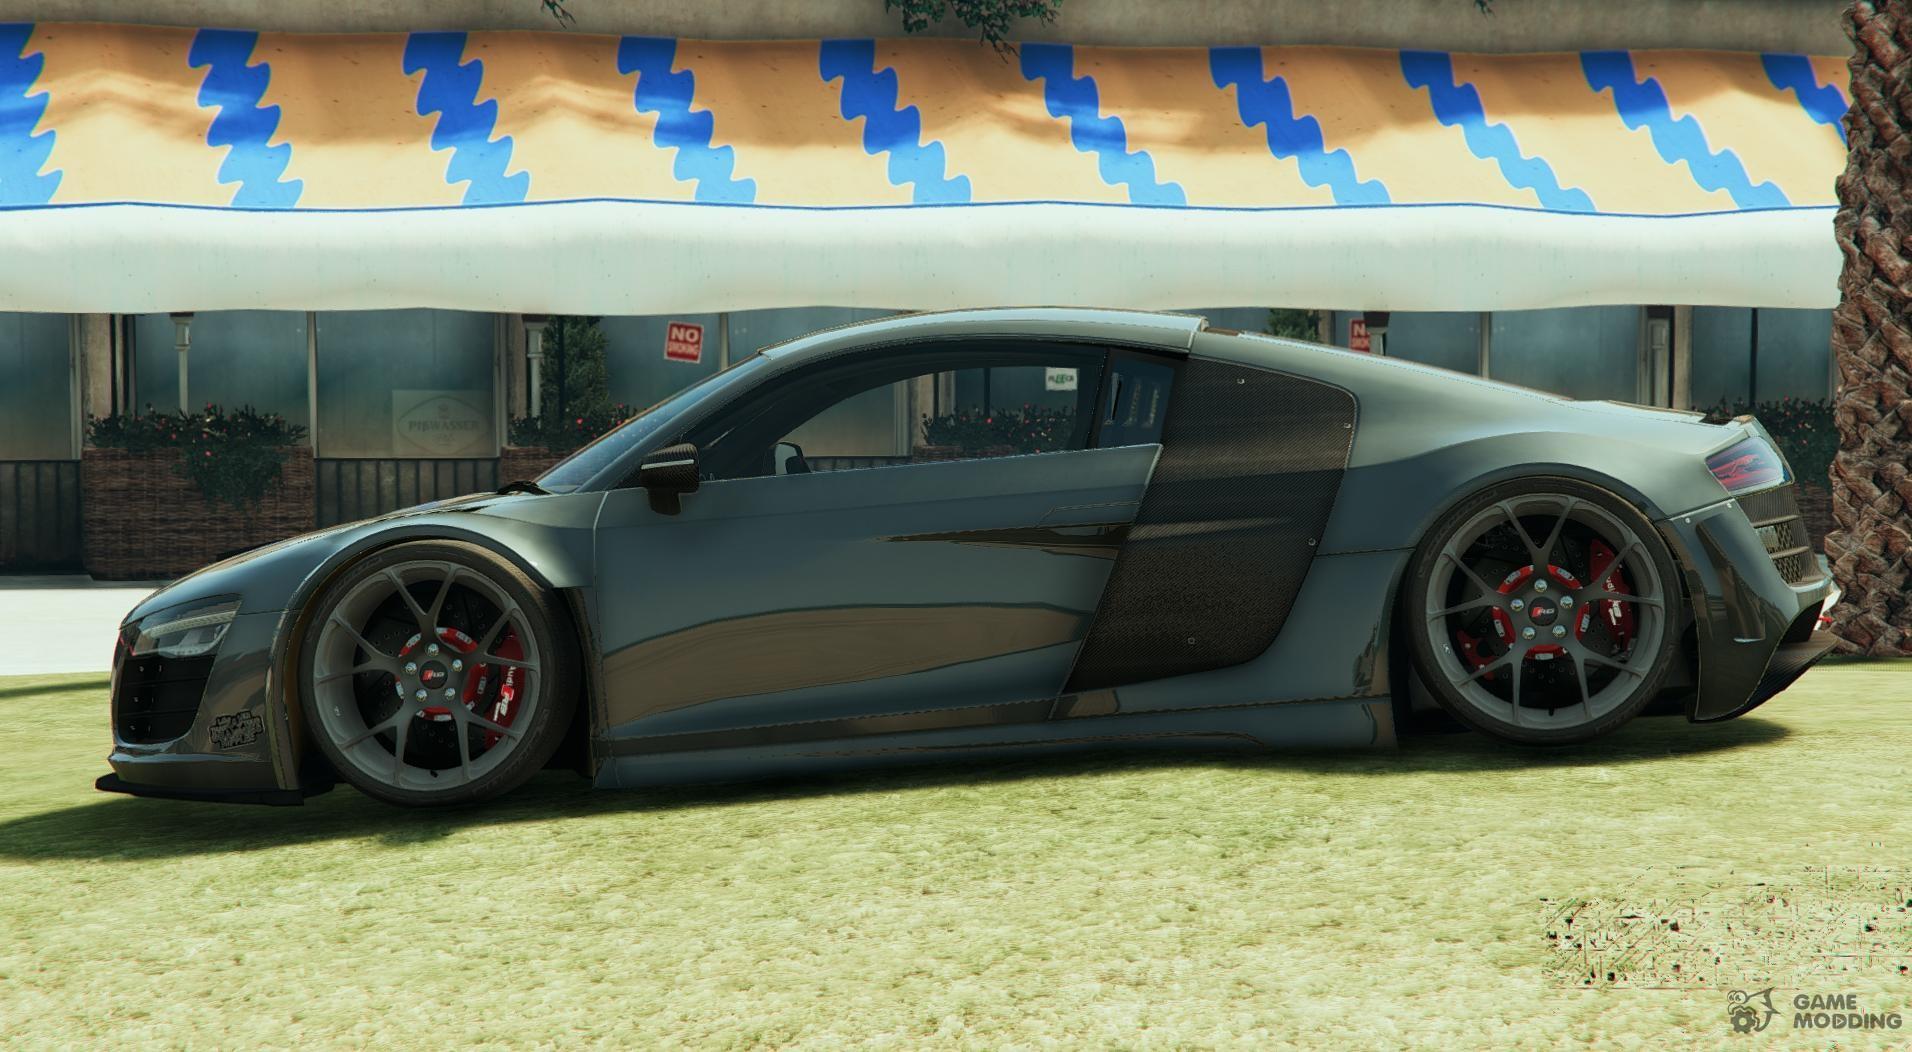 Audi r8 lms street custom for gta 5 audi r8 lms street custom for gta 5 rear left view publicscrutiny Images